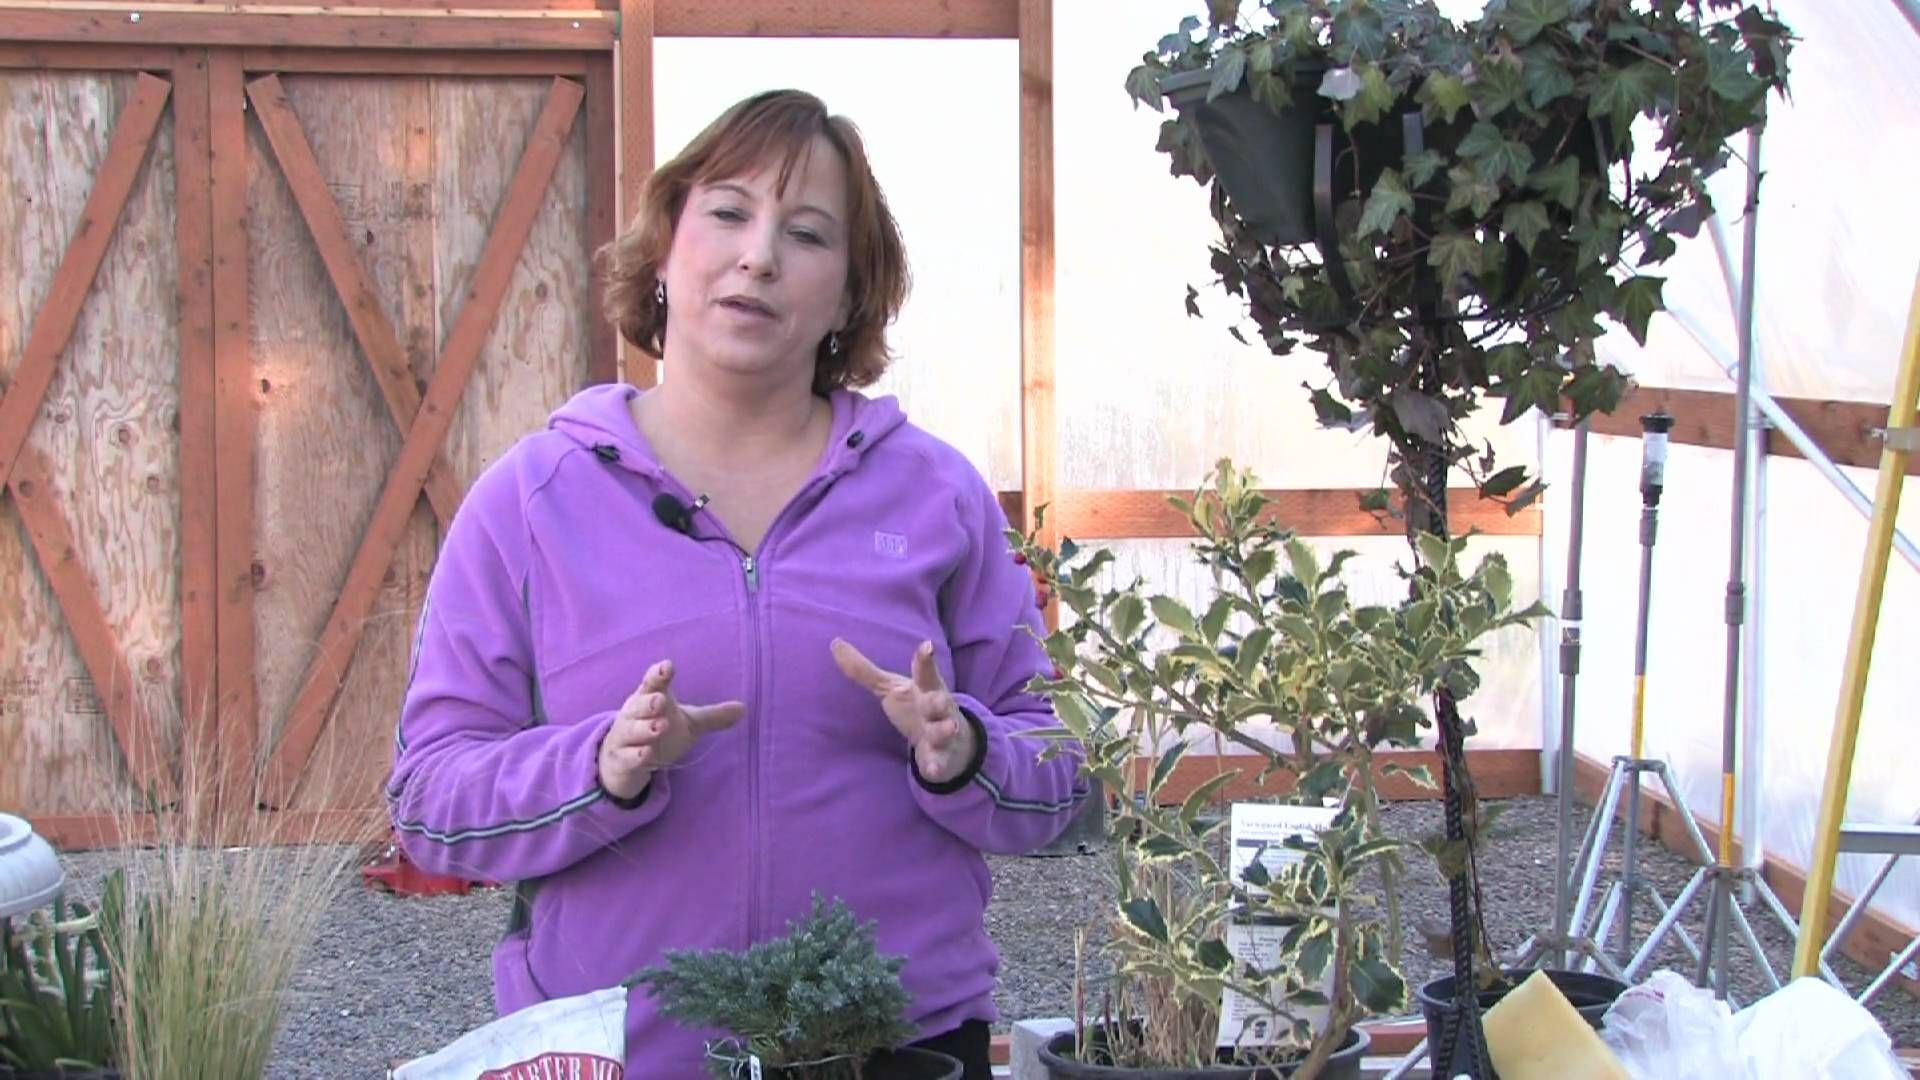 Gardening Tips How To Prune A Crape Myrtle Into A Tree Crape Myrtle Crepe Myrtle Gardening Tips